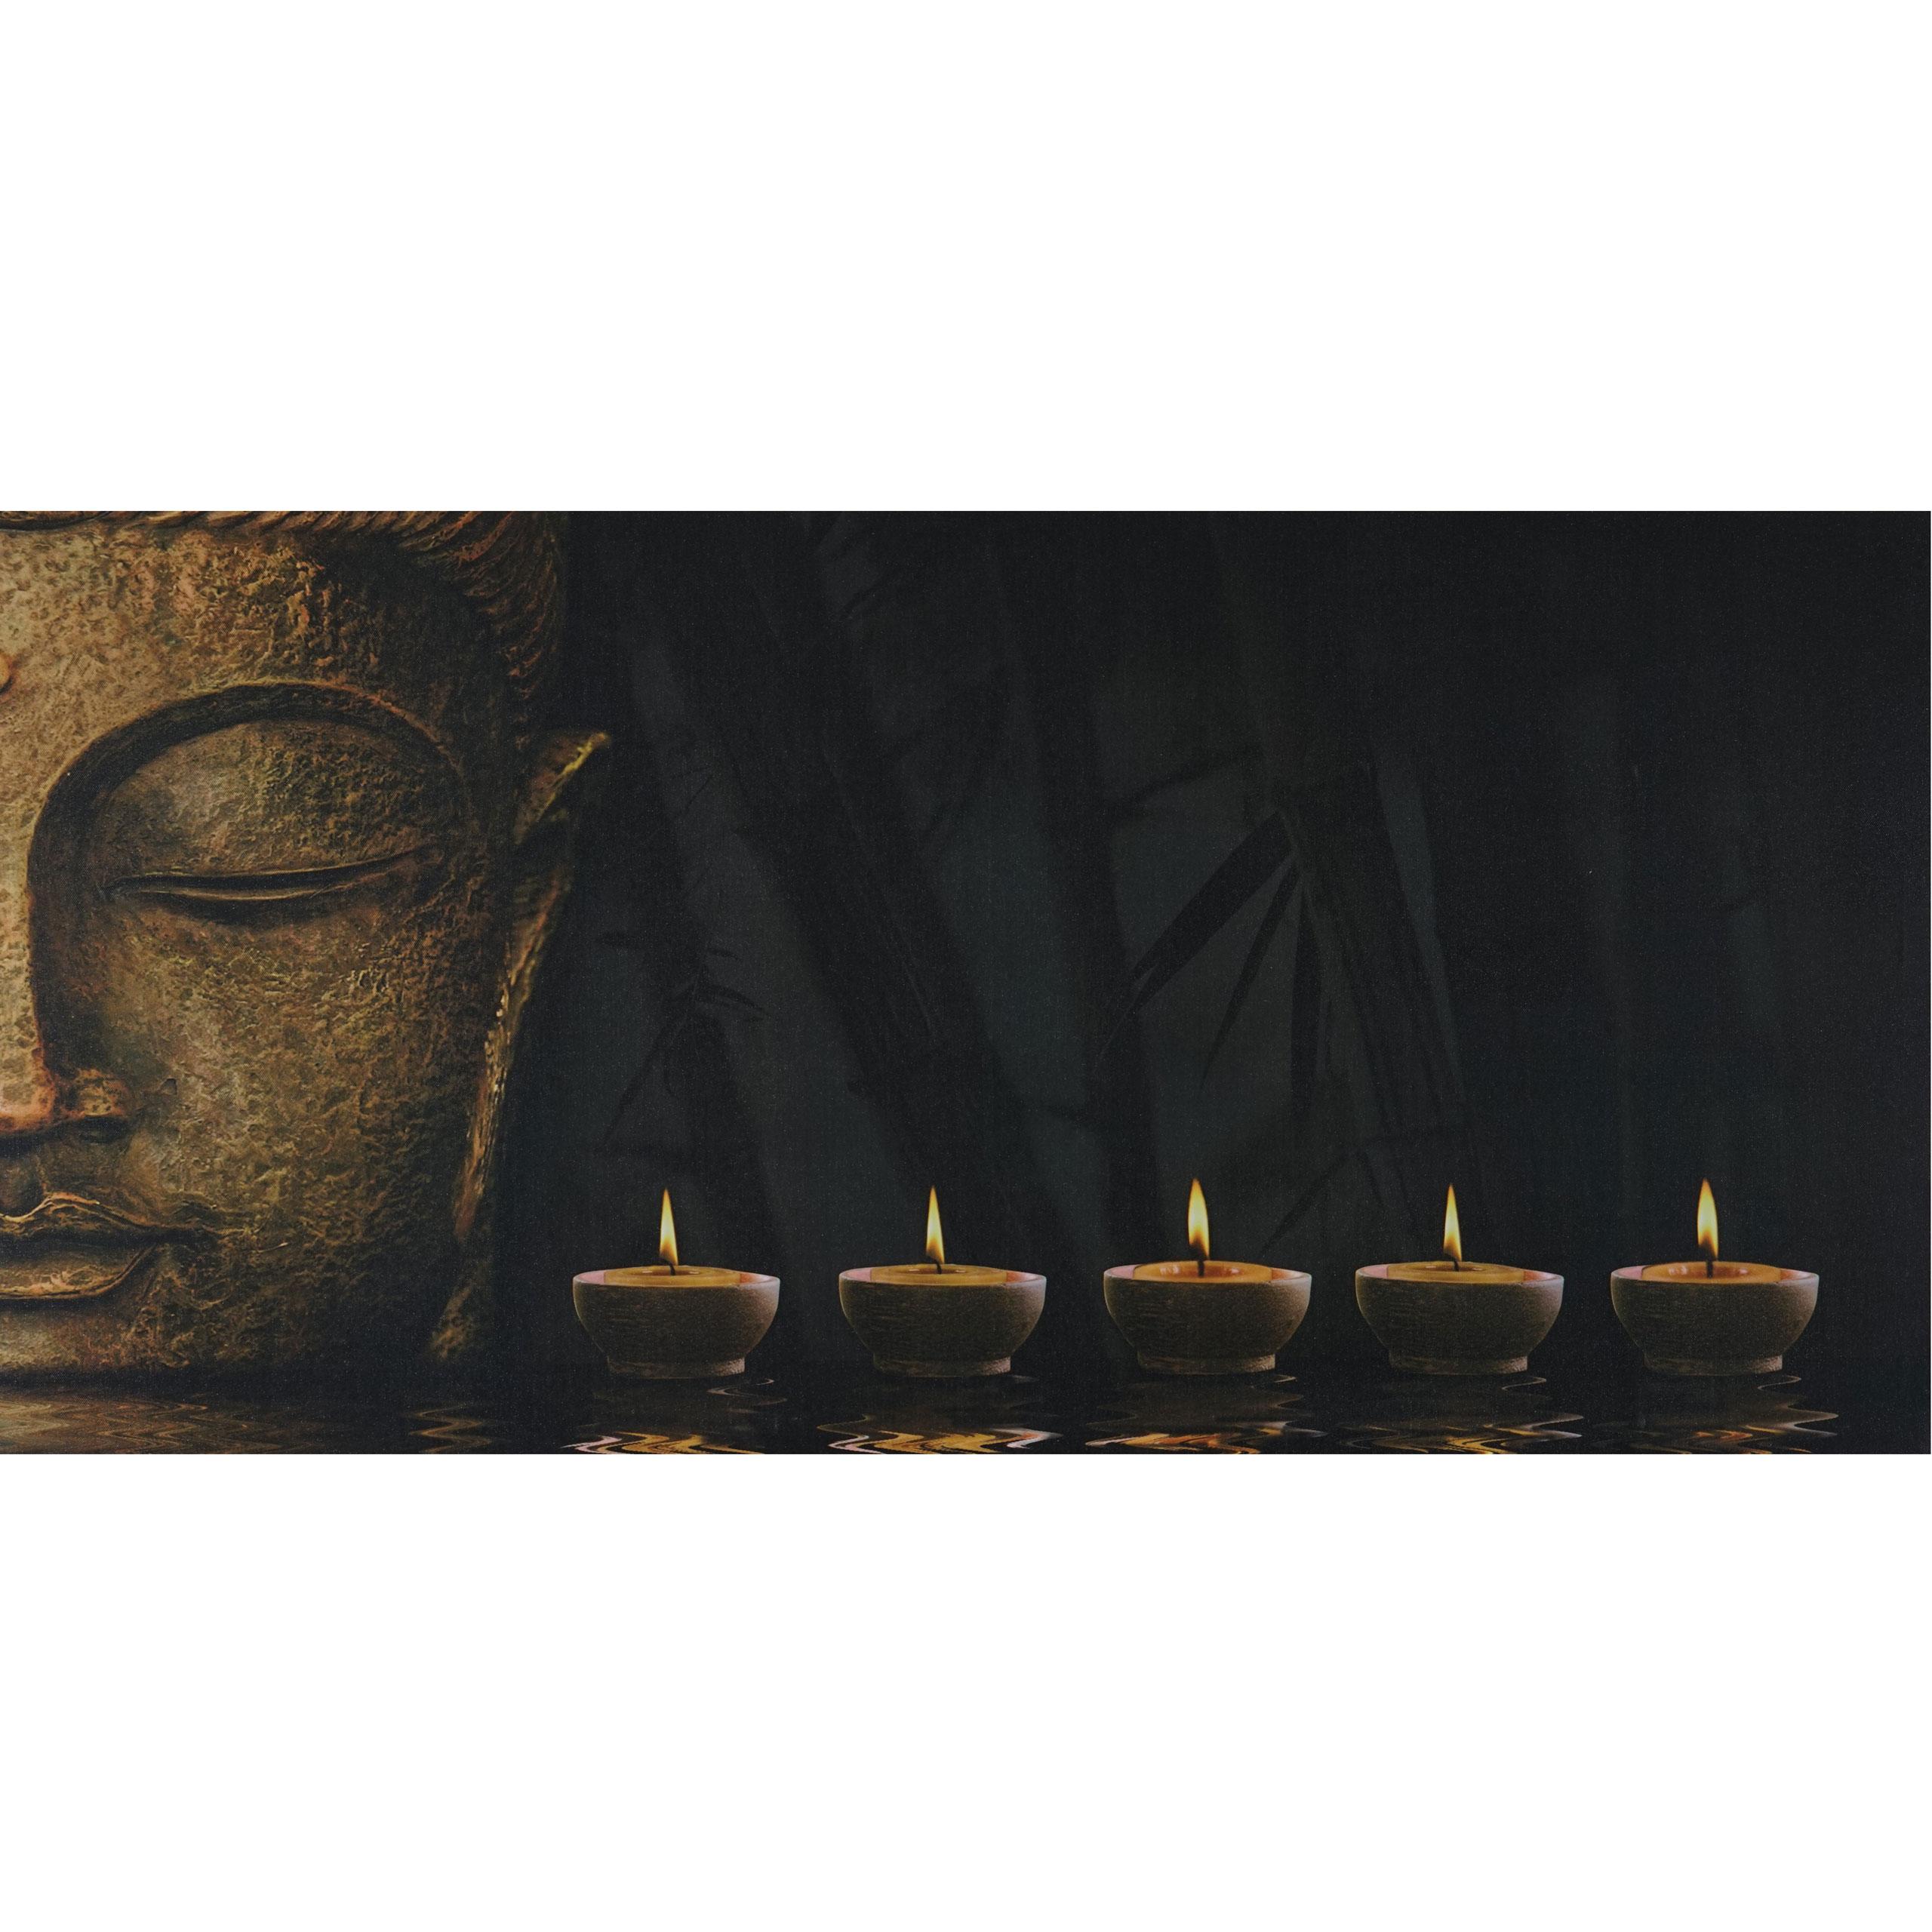 led bild mit beleuchtung timer 110x55cm buddha flackernd. Black Bedroom Furniture Sets. Home Design Ideas